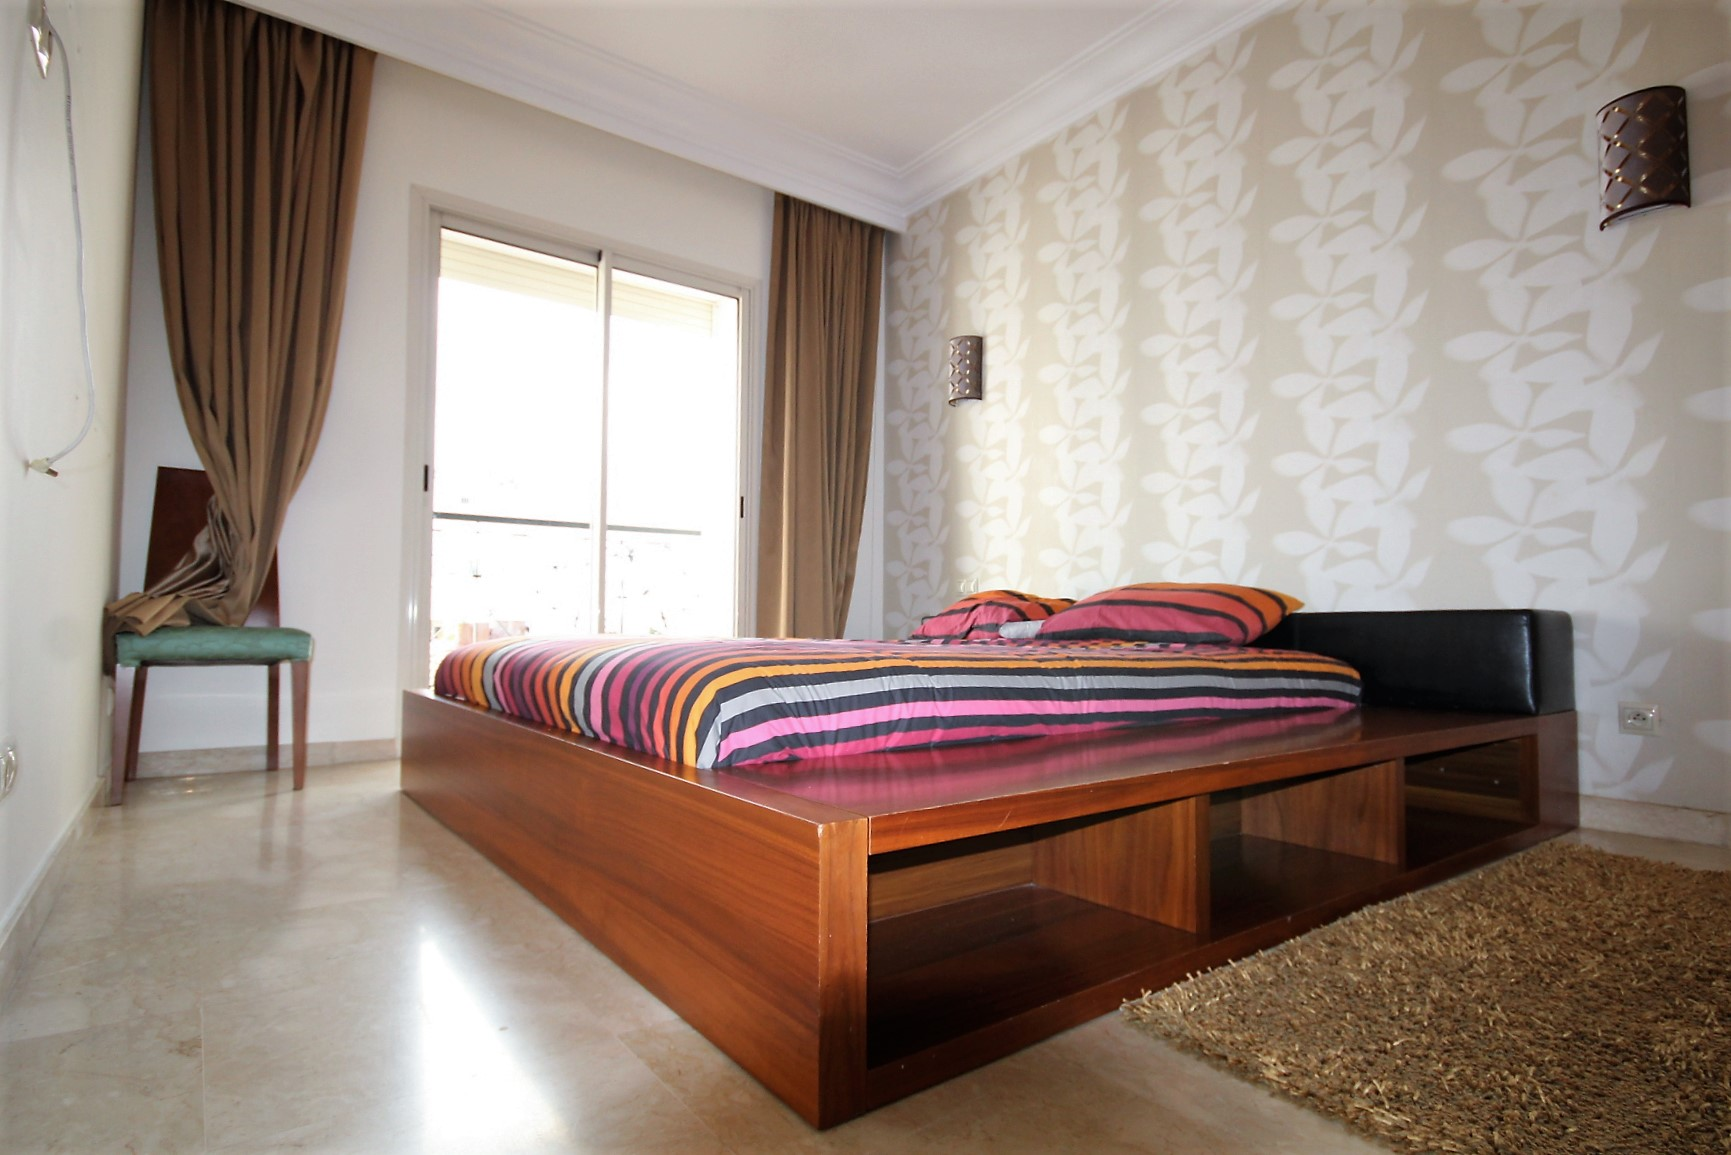 Maroc, Casablanca, Maarif extension vend luxueux appartement 2 chambres 118 m²